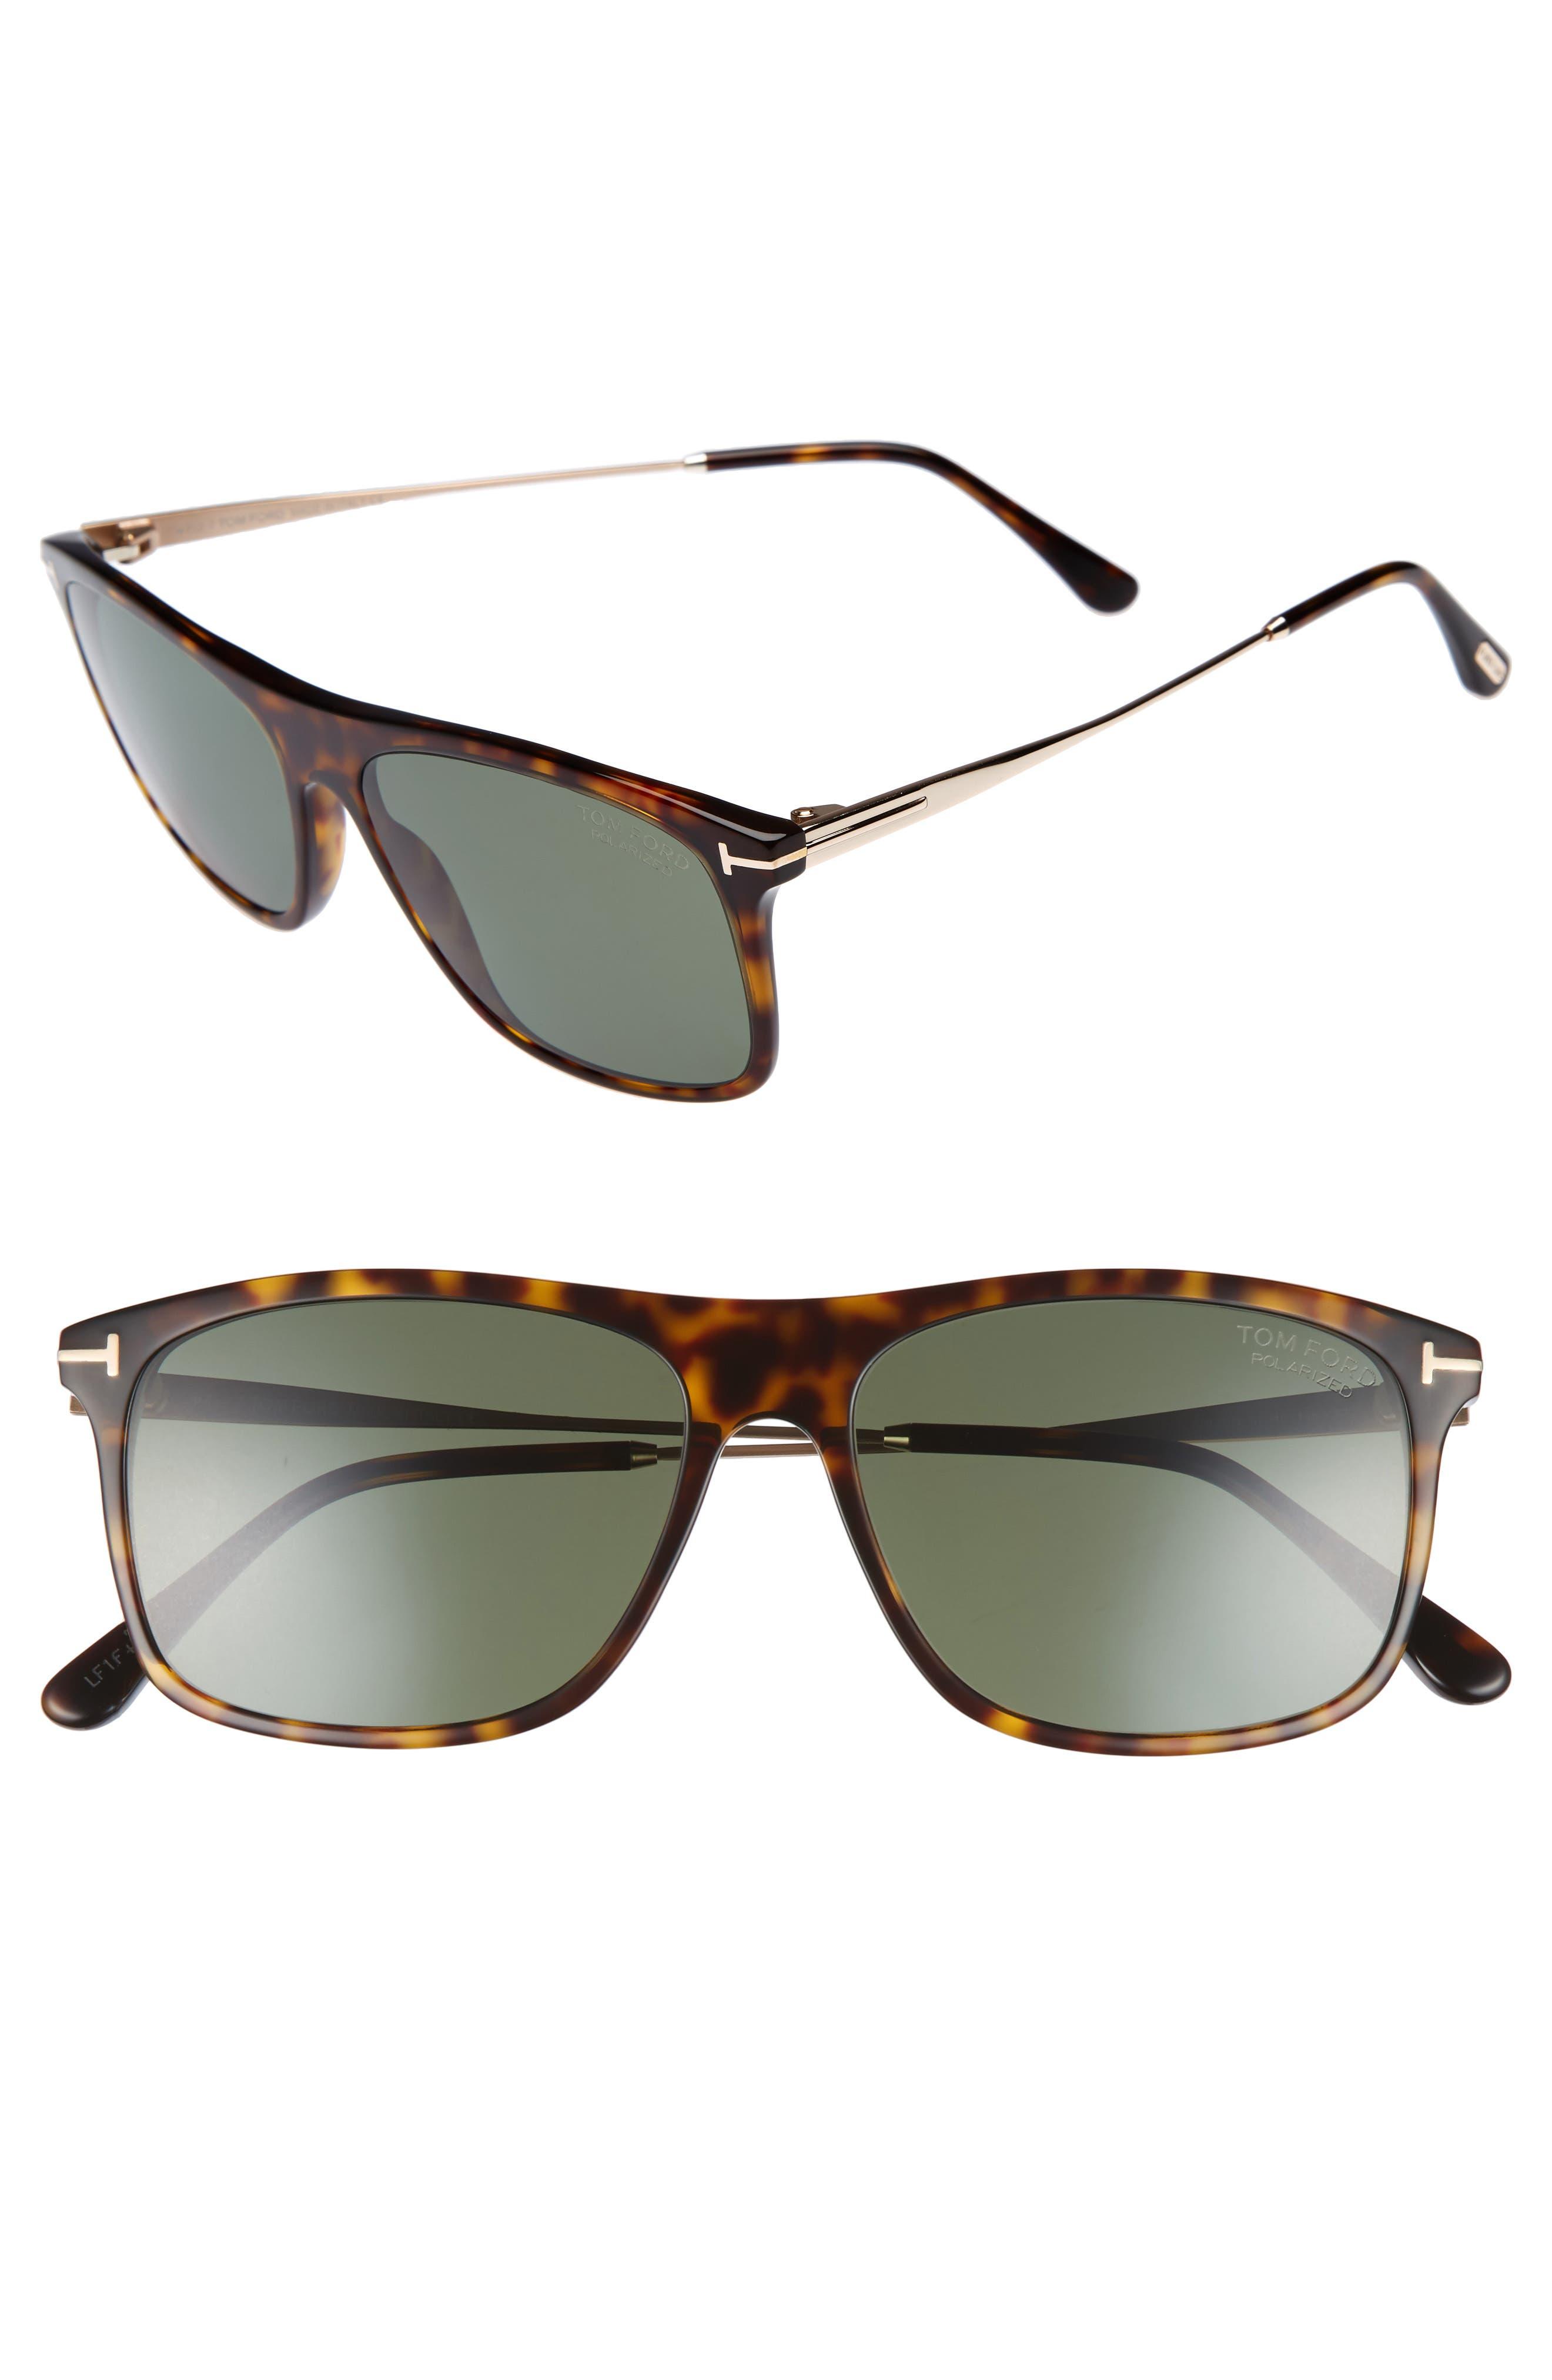 Tom Ford Max 57mm Polarized Sunglasses